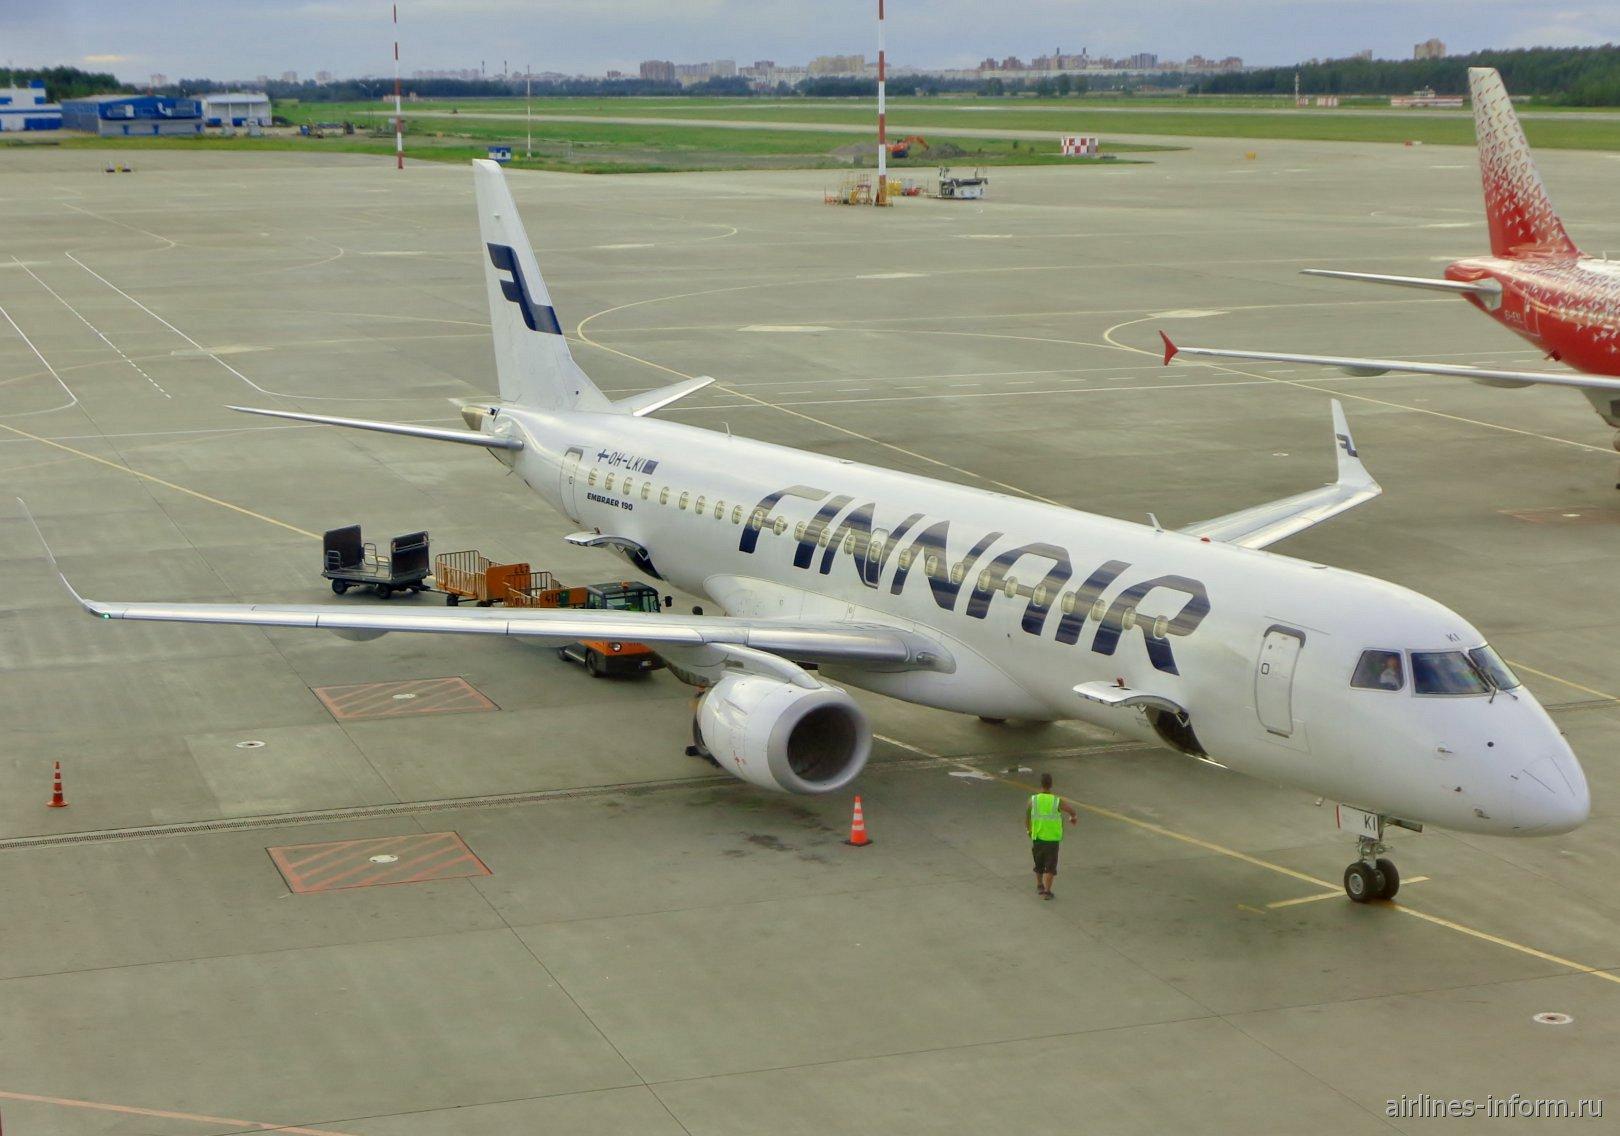 Самолет Embraer 190 авиакомпании Finnair в аэропорту Пулково